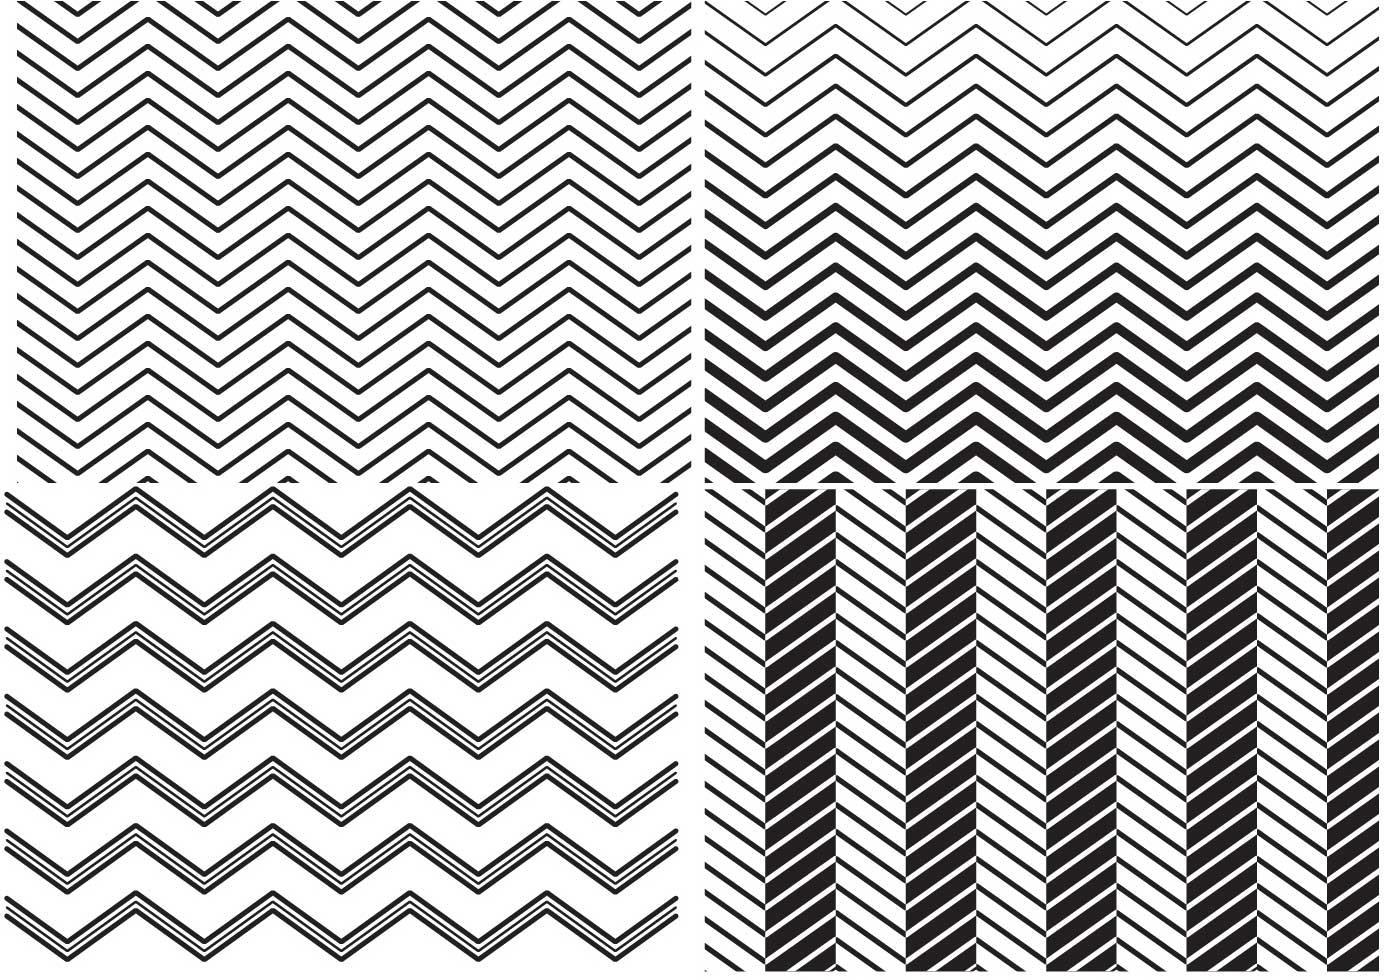 chevron pattern svg - HD1400×980